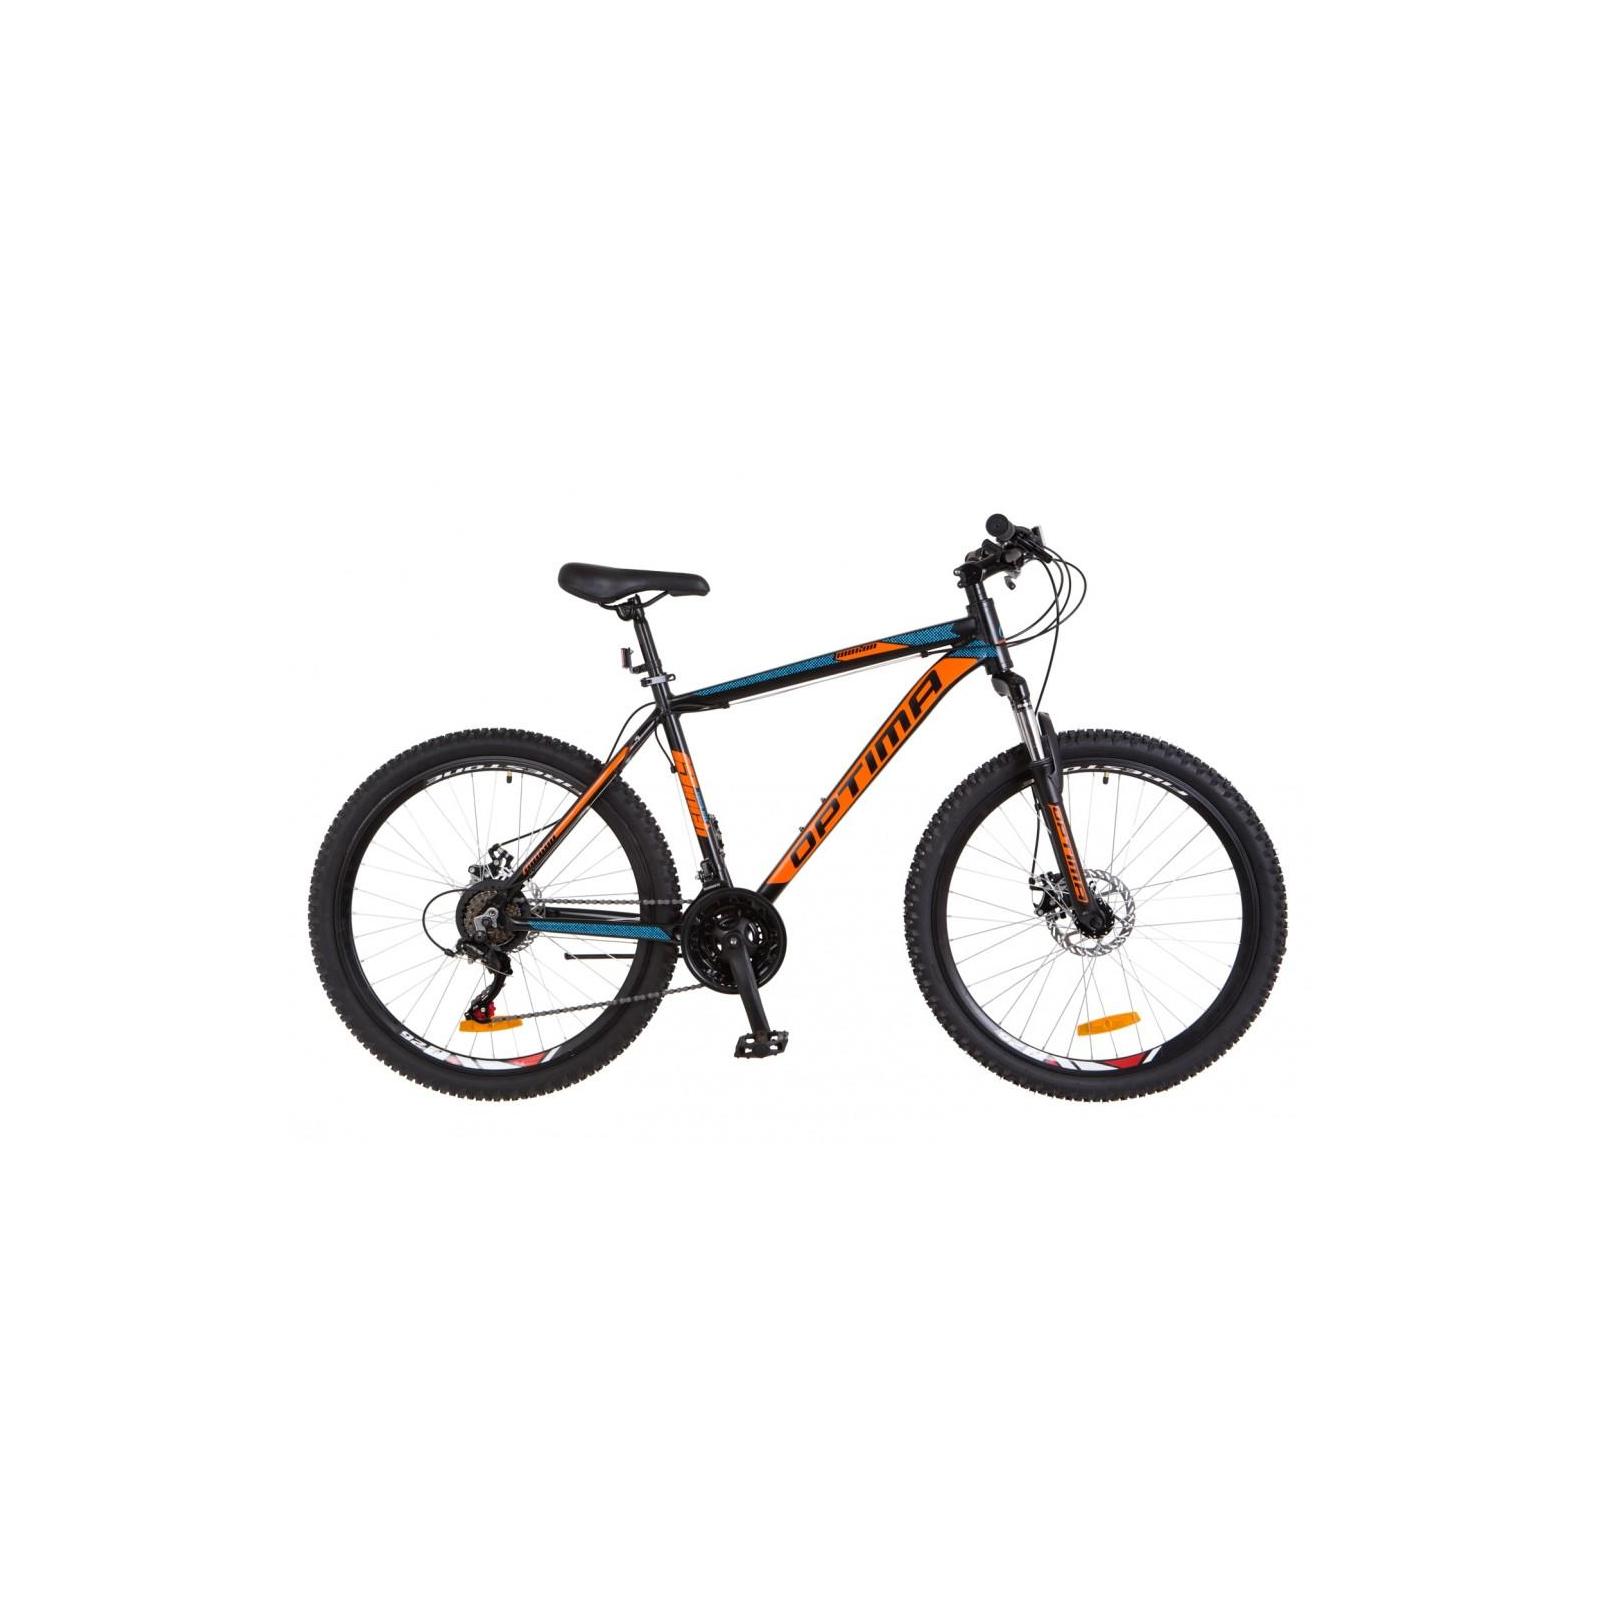 "Велосипед Optimabikes 26"" MOTION 2018 AM 14G DD рама-13"" Al черно-оранжевый (OPS-OP-26-111)"